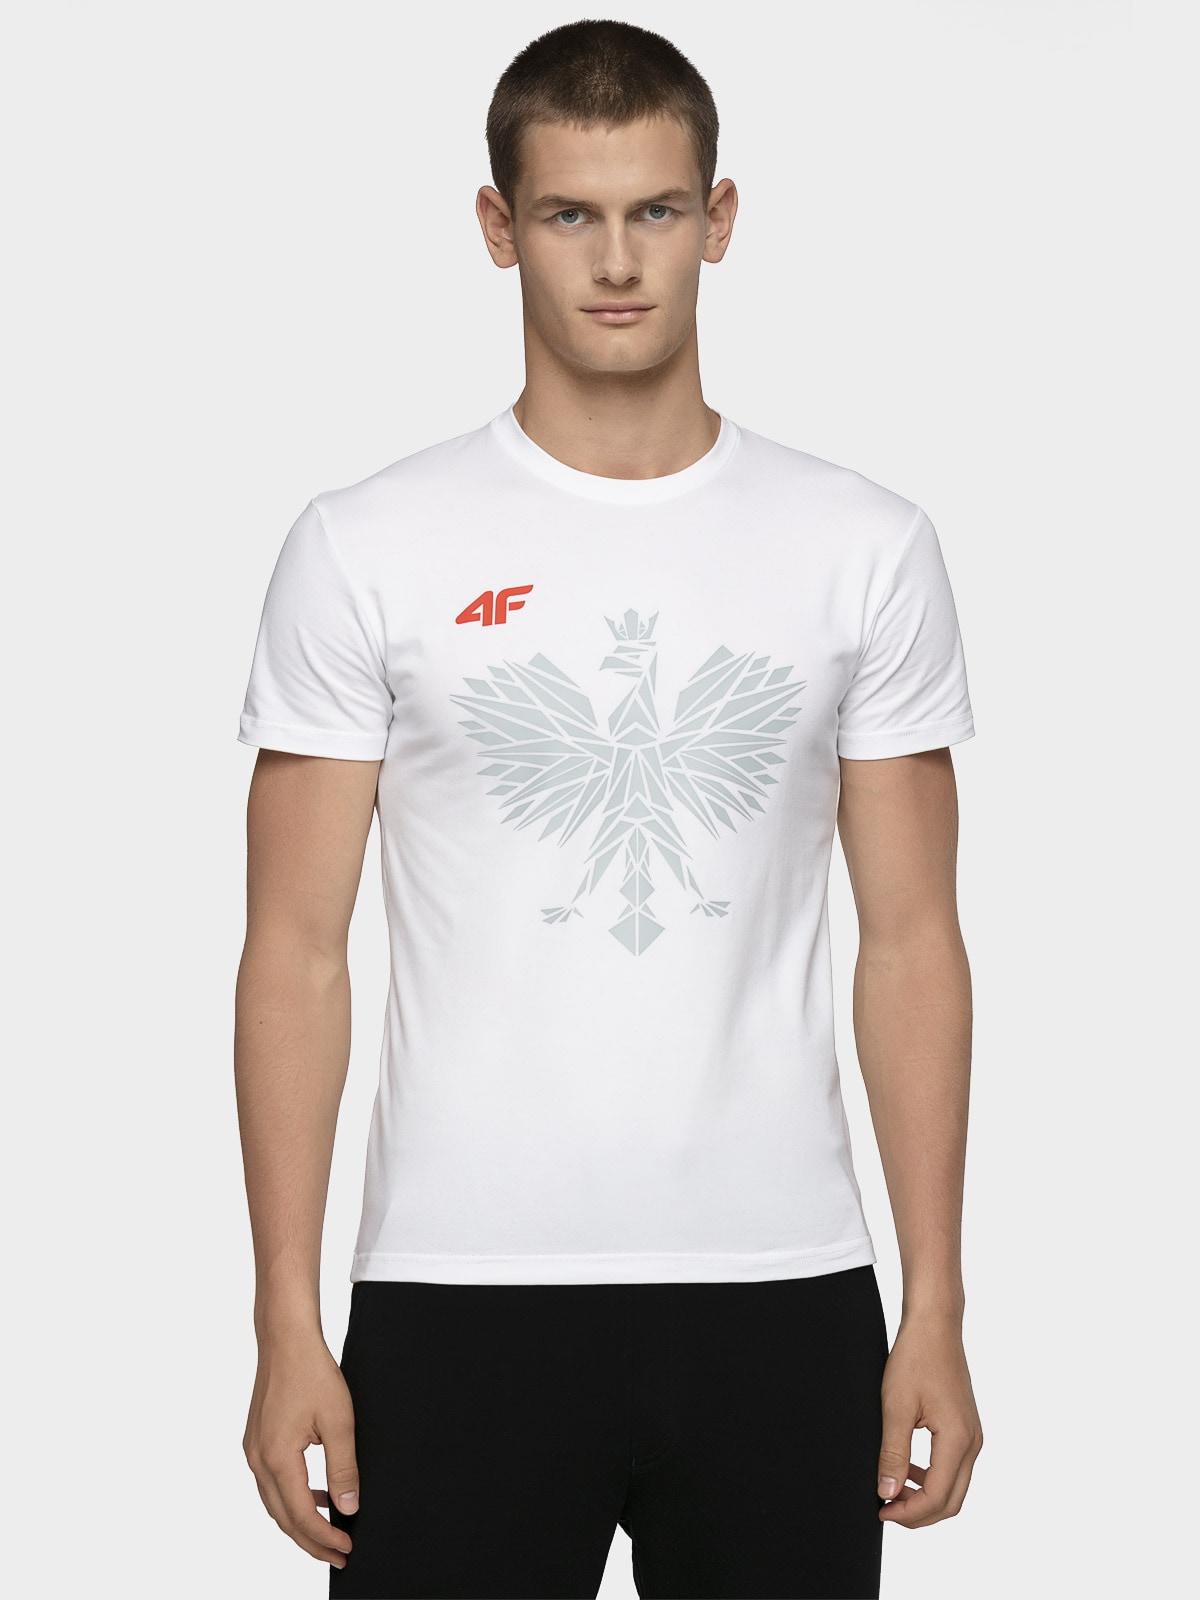 63dc281f659843 Koszulka kibica PZLA męska TSMF101 - biały